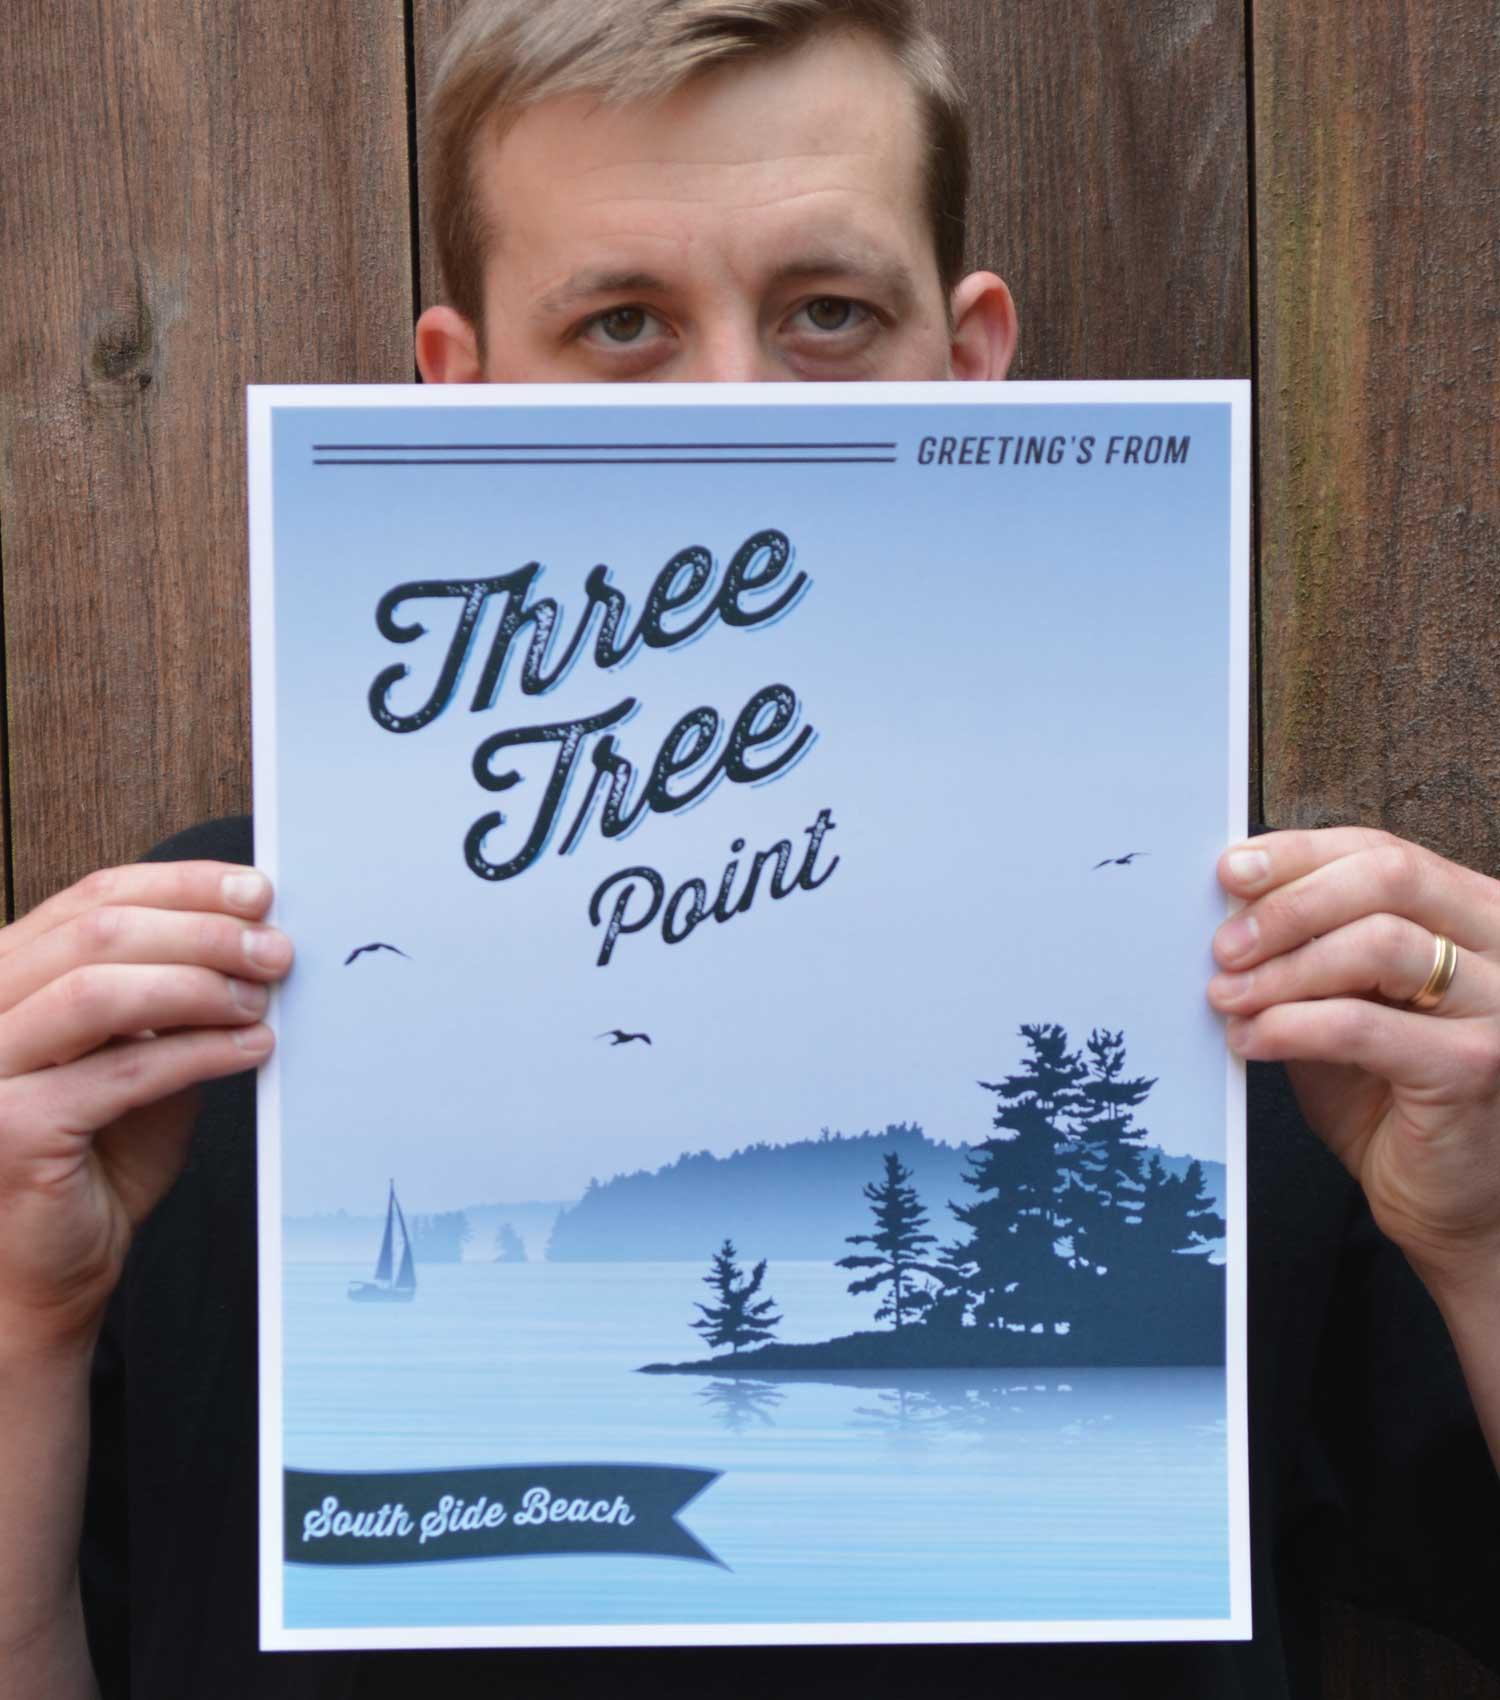 Blog_Three_Tree_Point.jpg